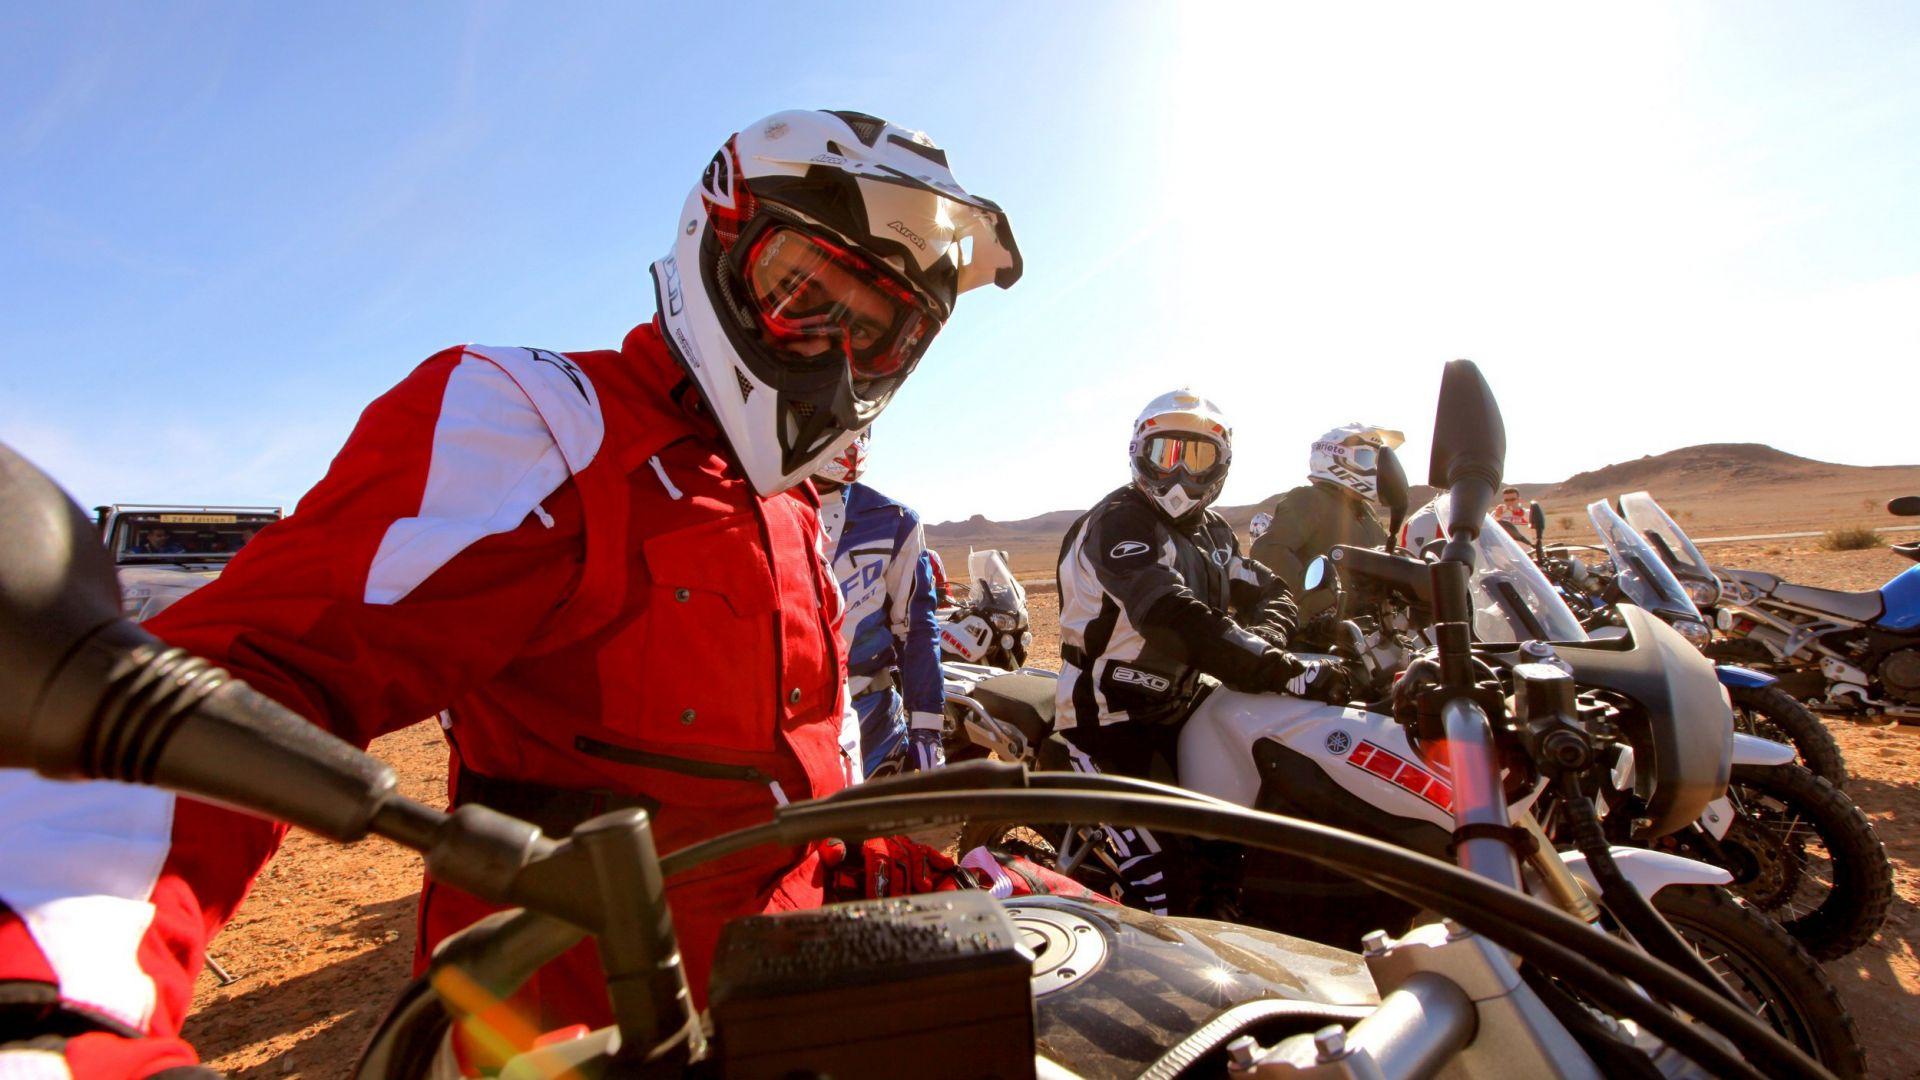 Immagine 82: In Marocco con la Yamaha Super Ténéré